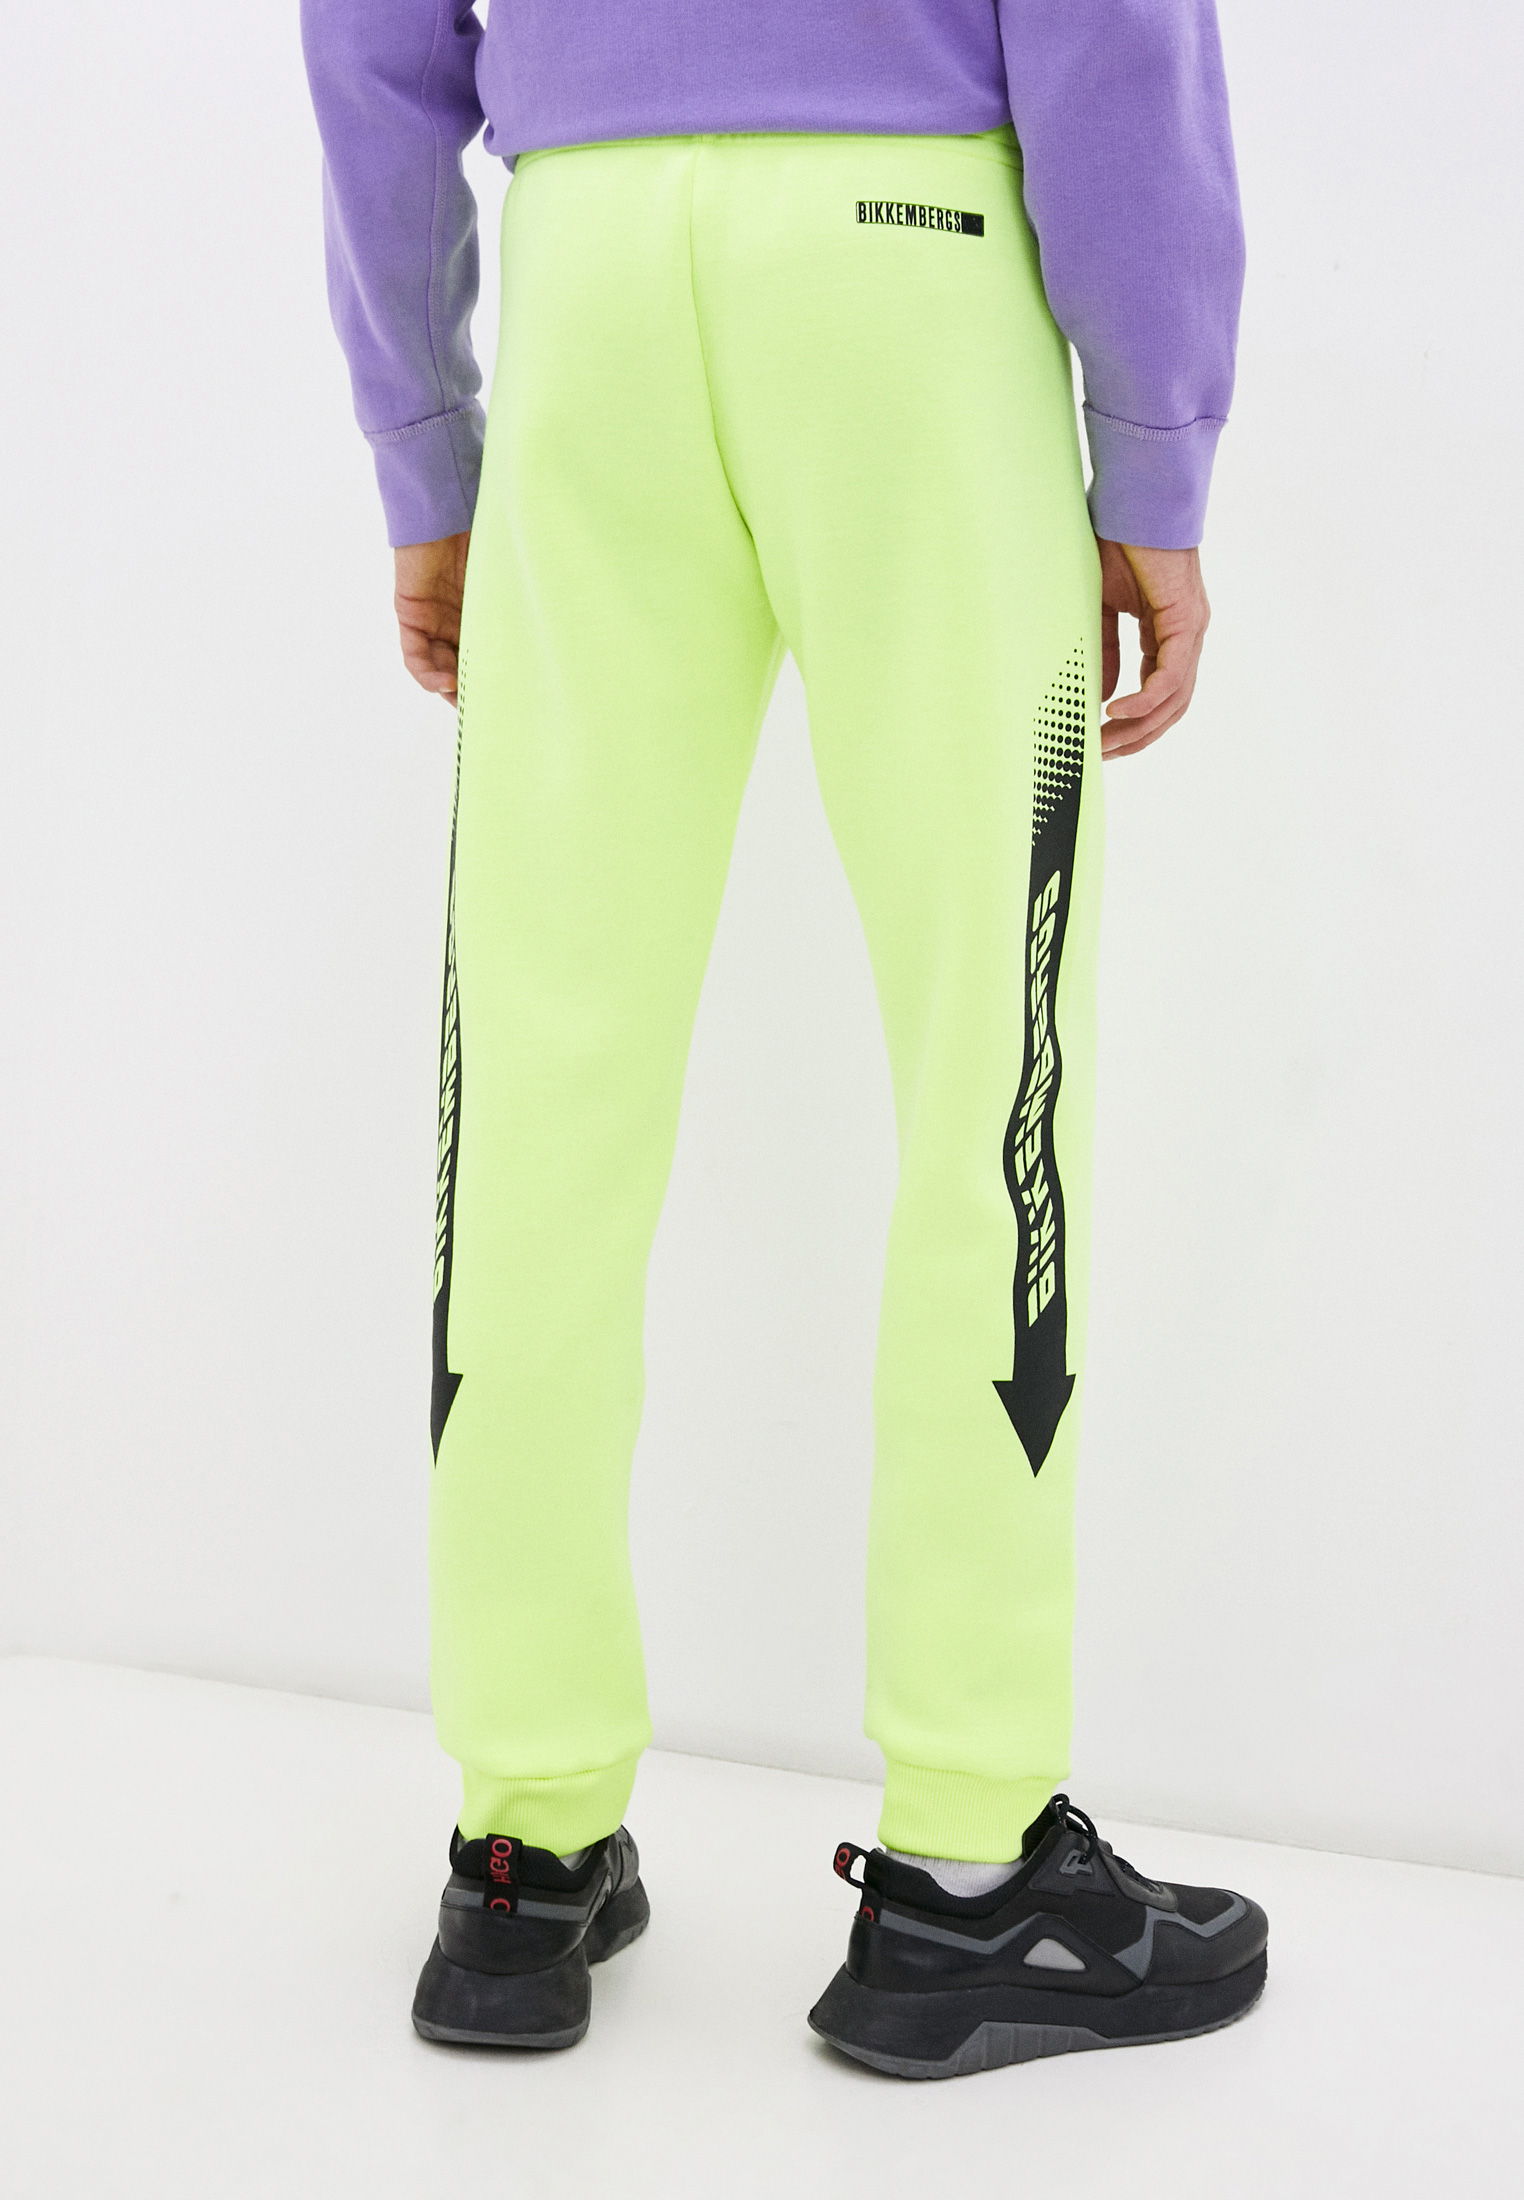 Мужские спортивные брюки Bikkembergs (Биккембергс) C 1 096 9E M 4119: изображение 4